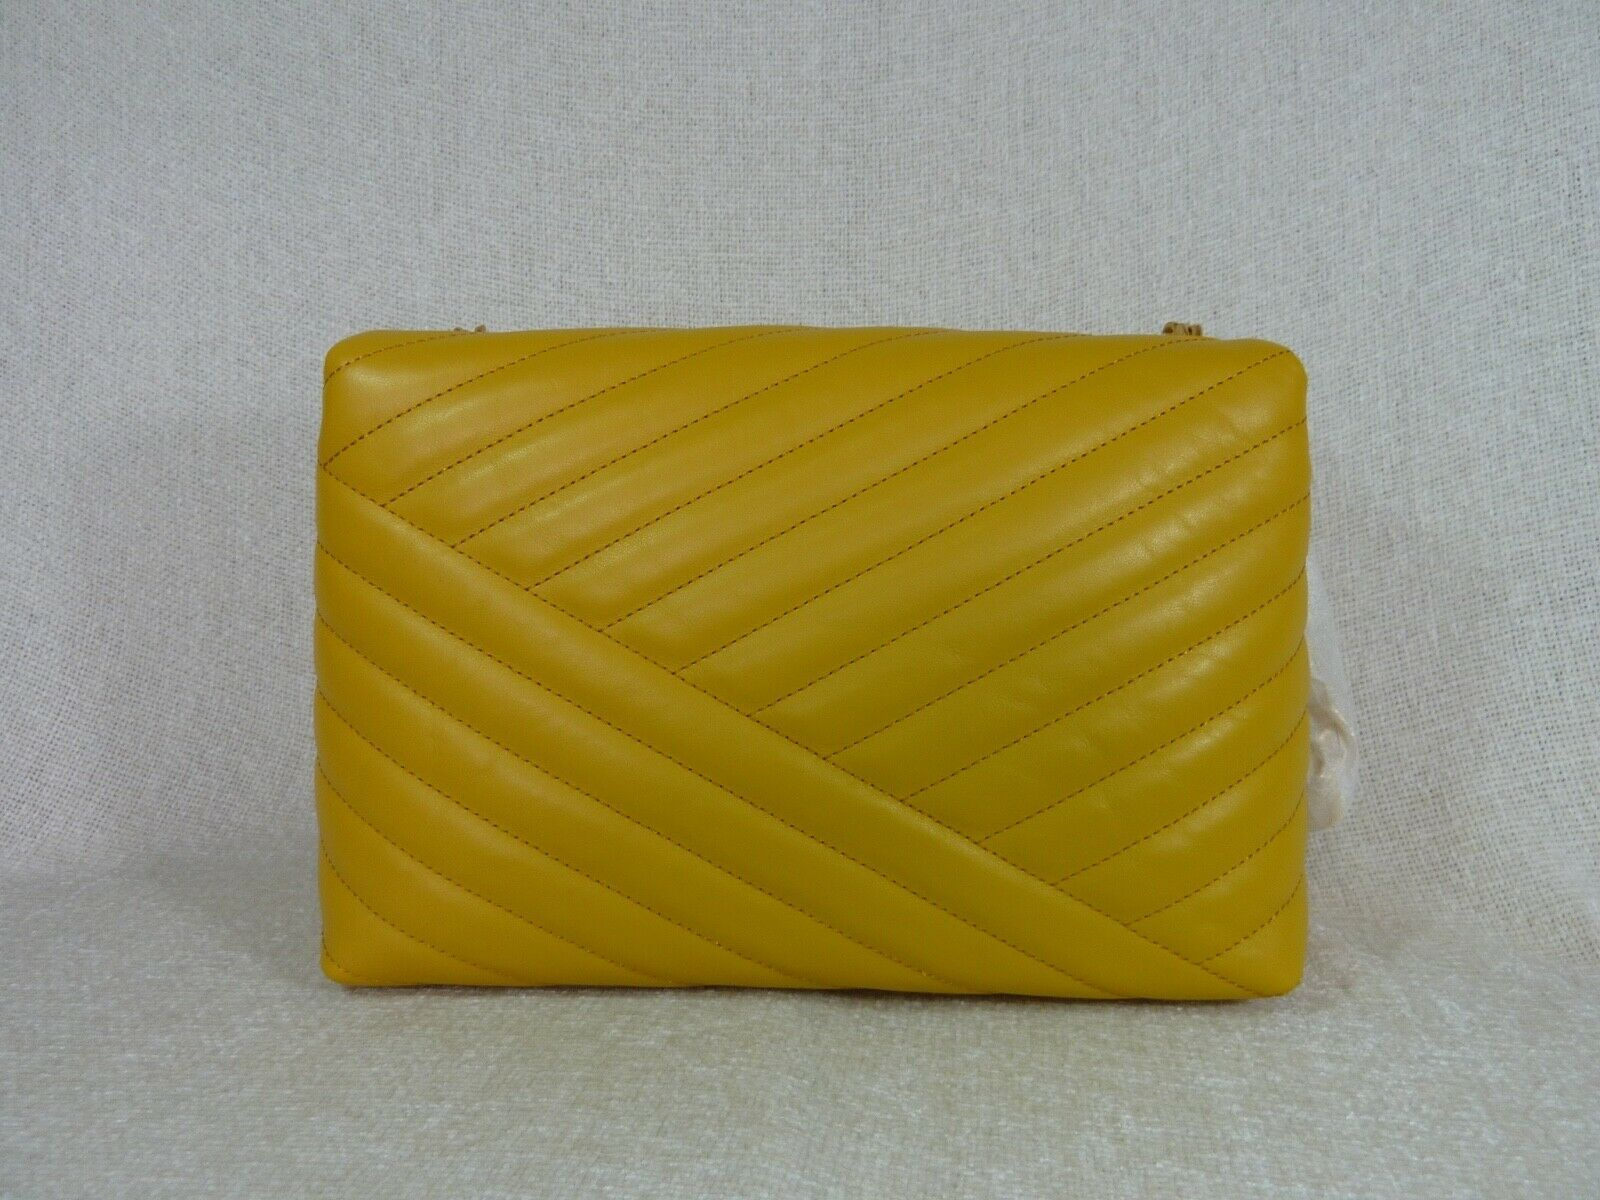 NWT Tory Burch Daylily Kira Chevron Flap Shoulder Bag $528 image 4